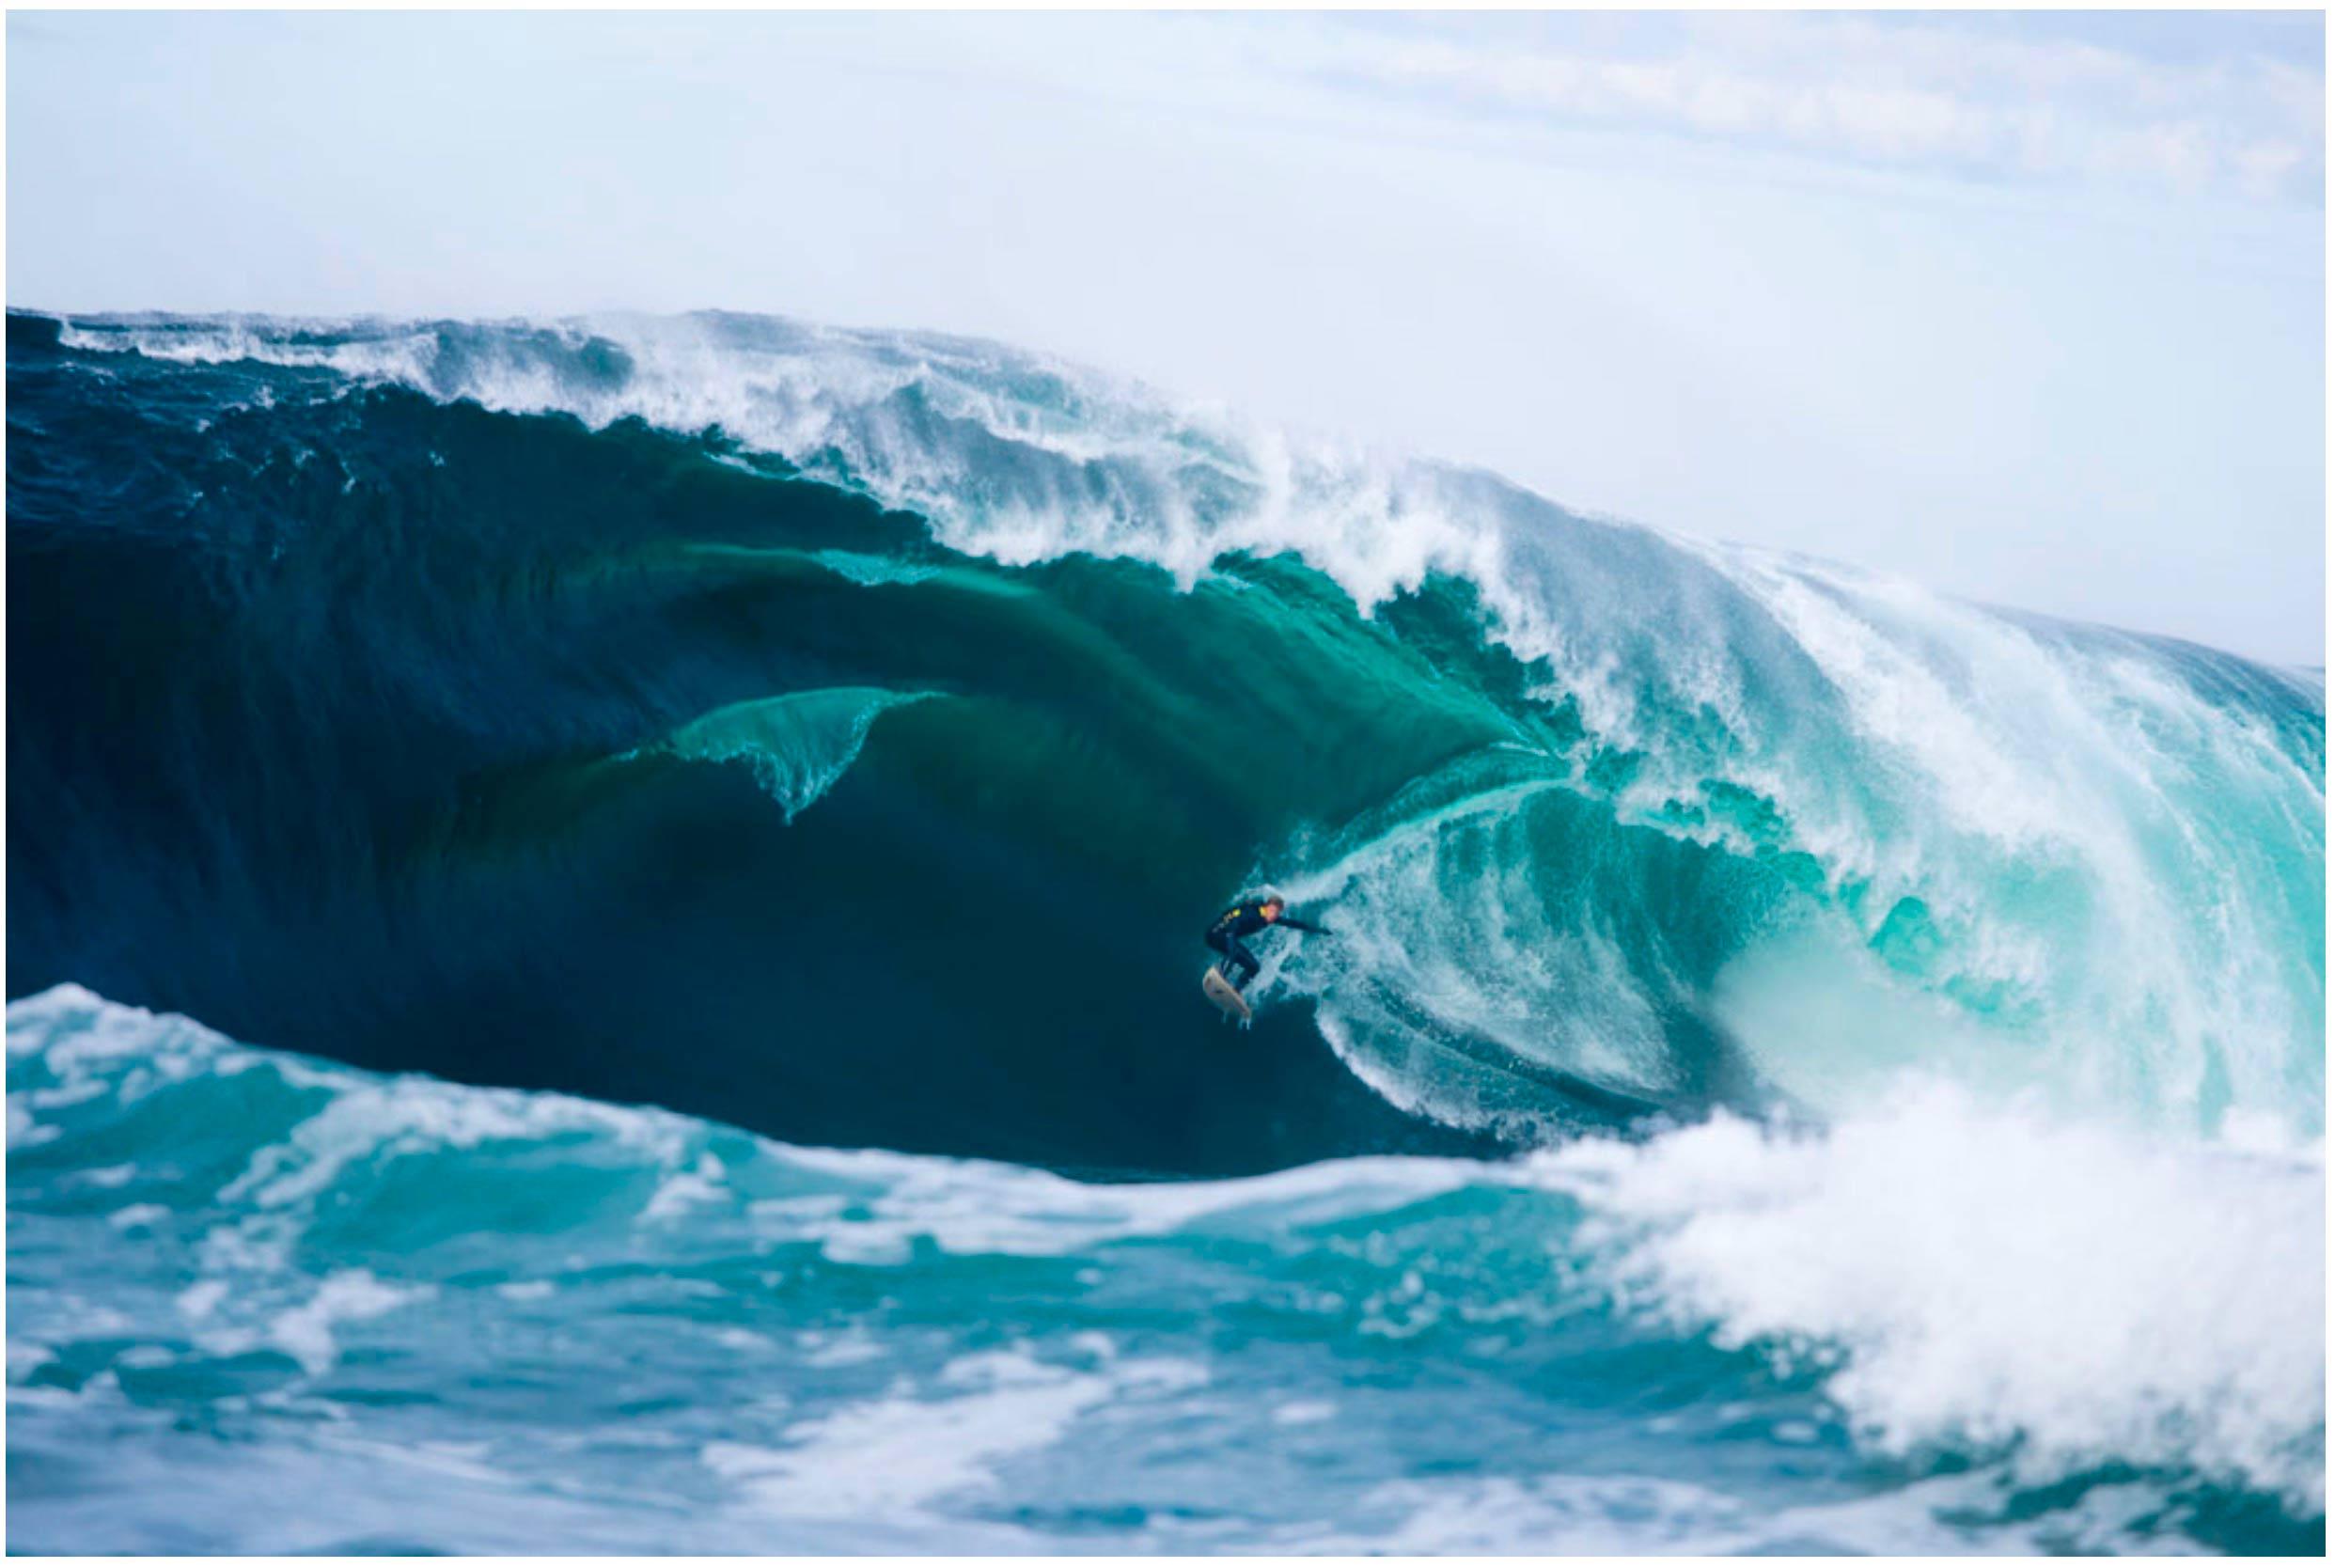 rodd-owen-surf-photography-for-sale-owenphoto-274.jpg